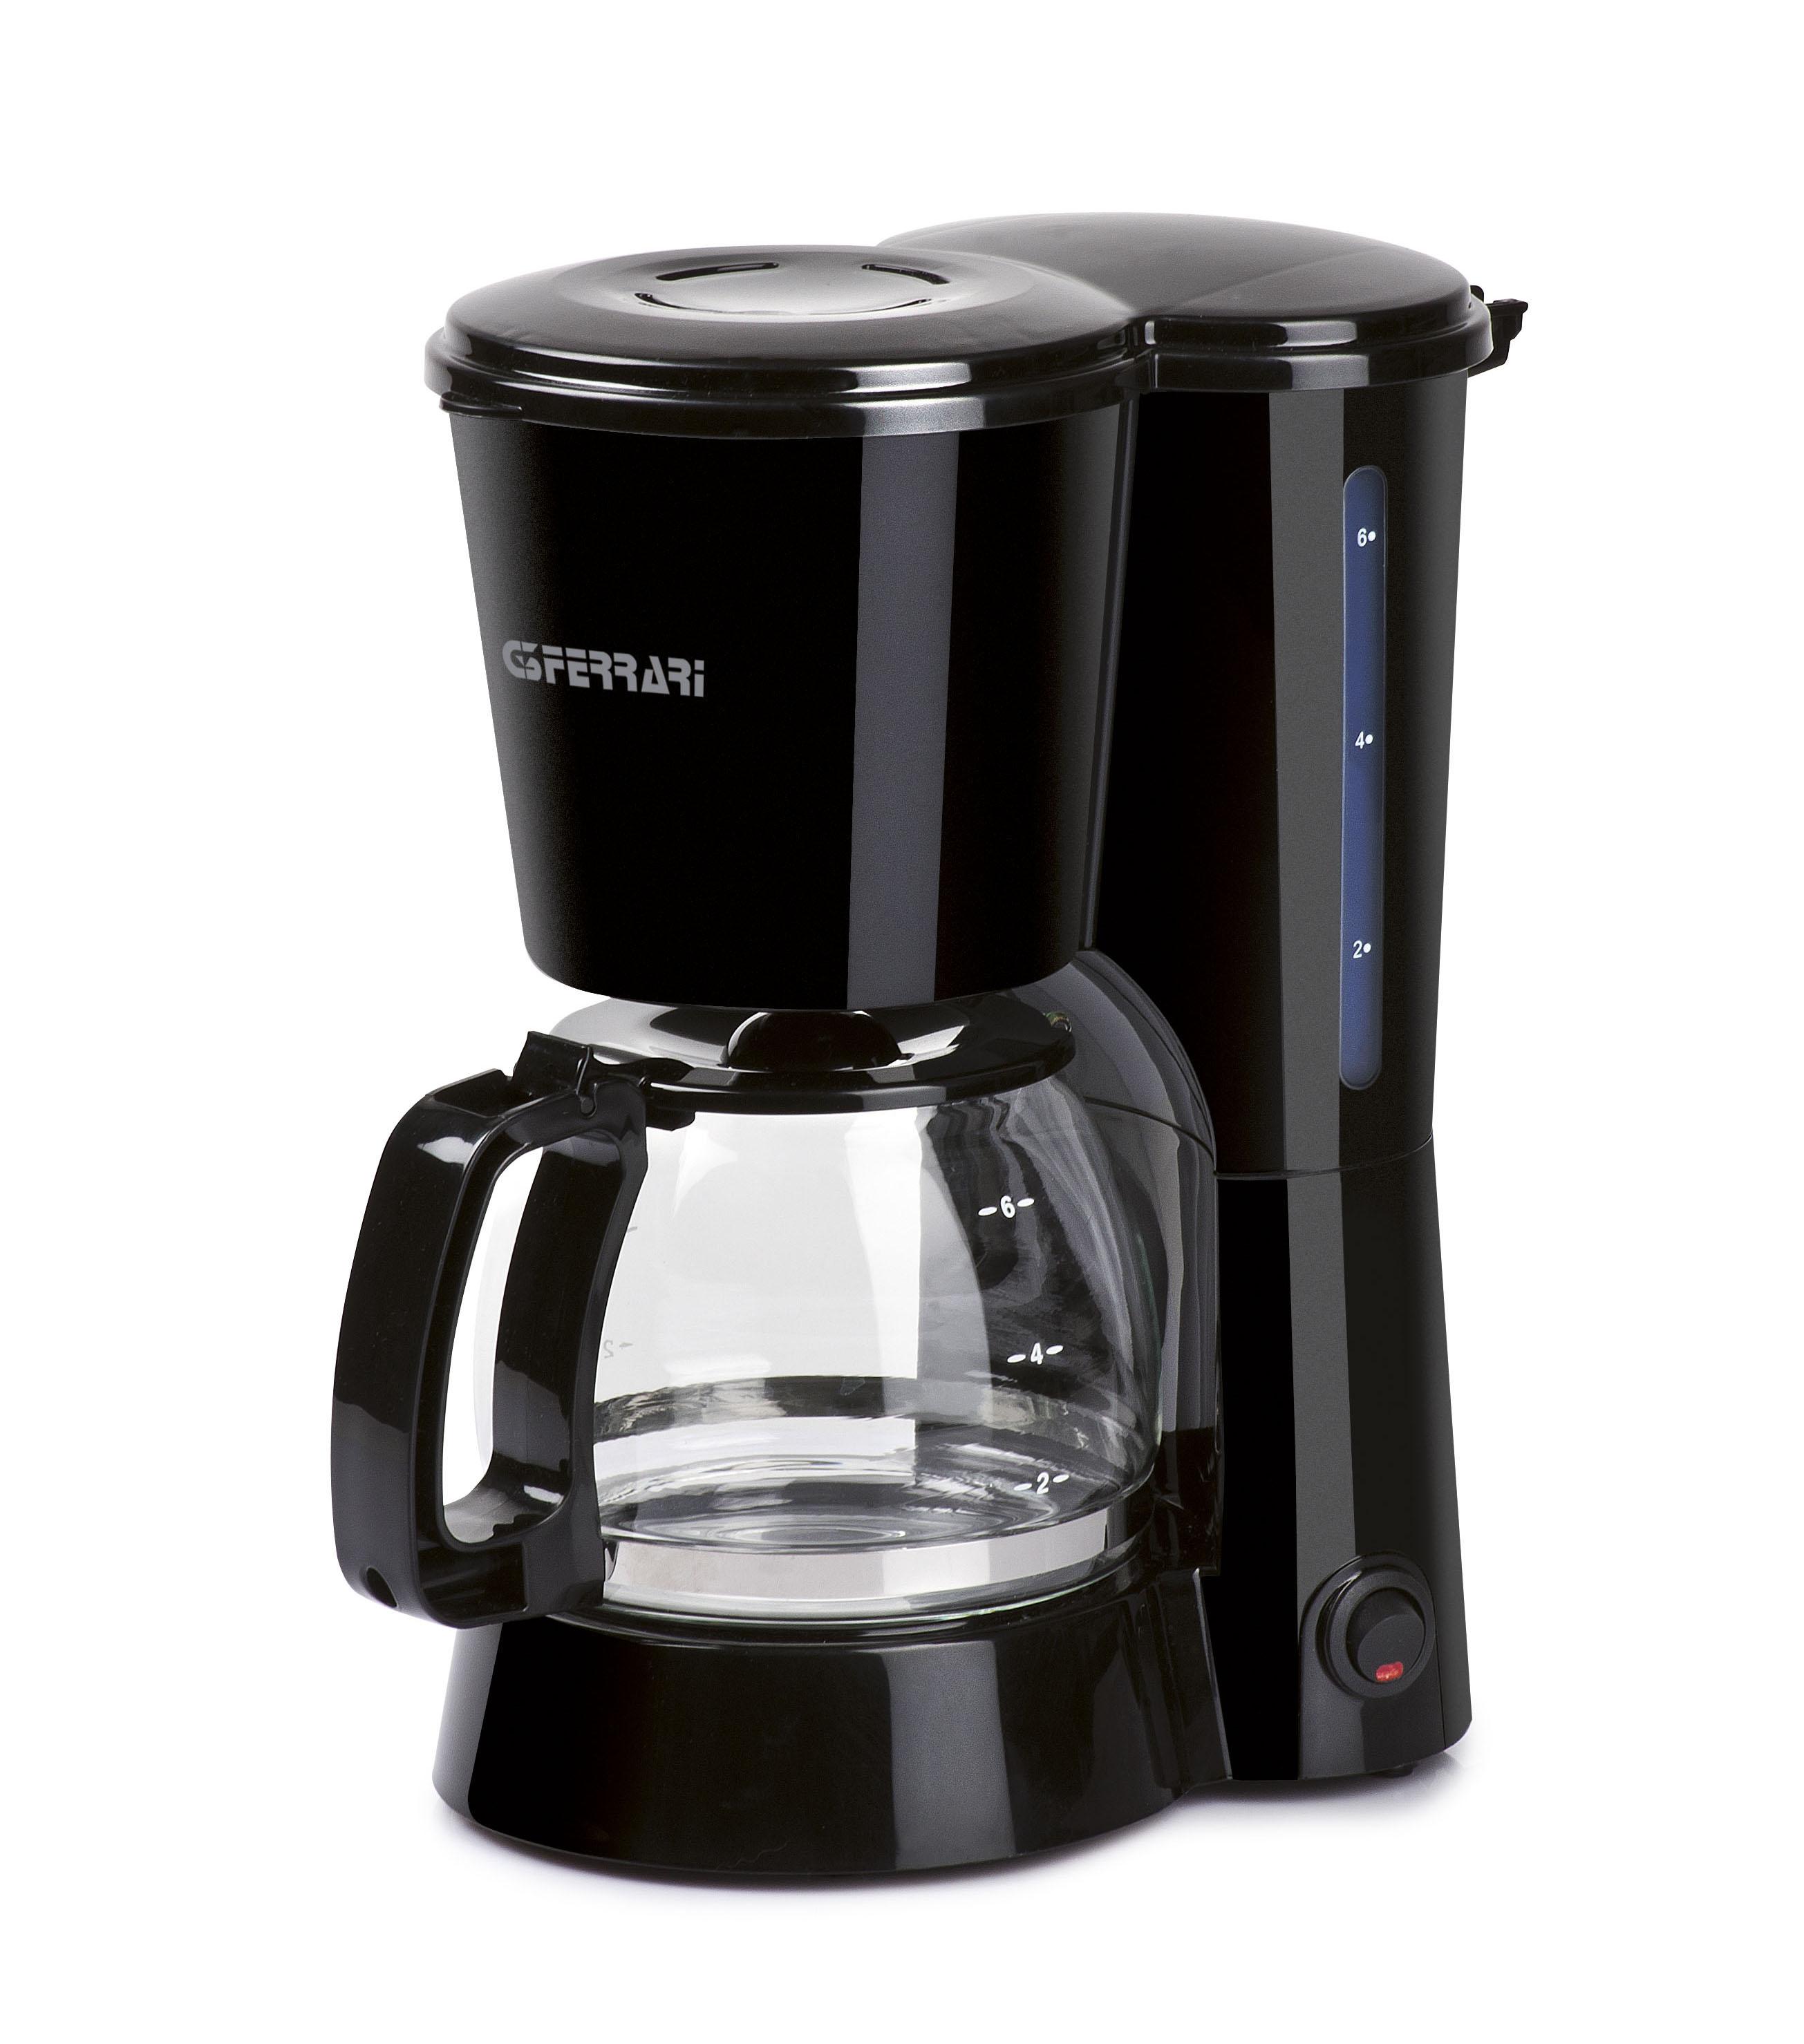 Aeropress Coffee Maker Demo : GRANCAFE Coffee maker Cooking G3Ferrari